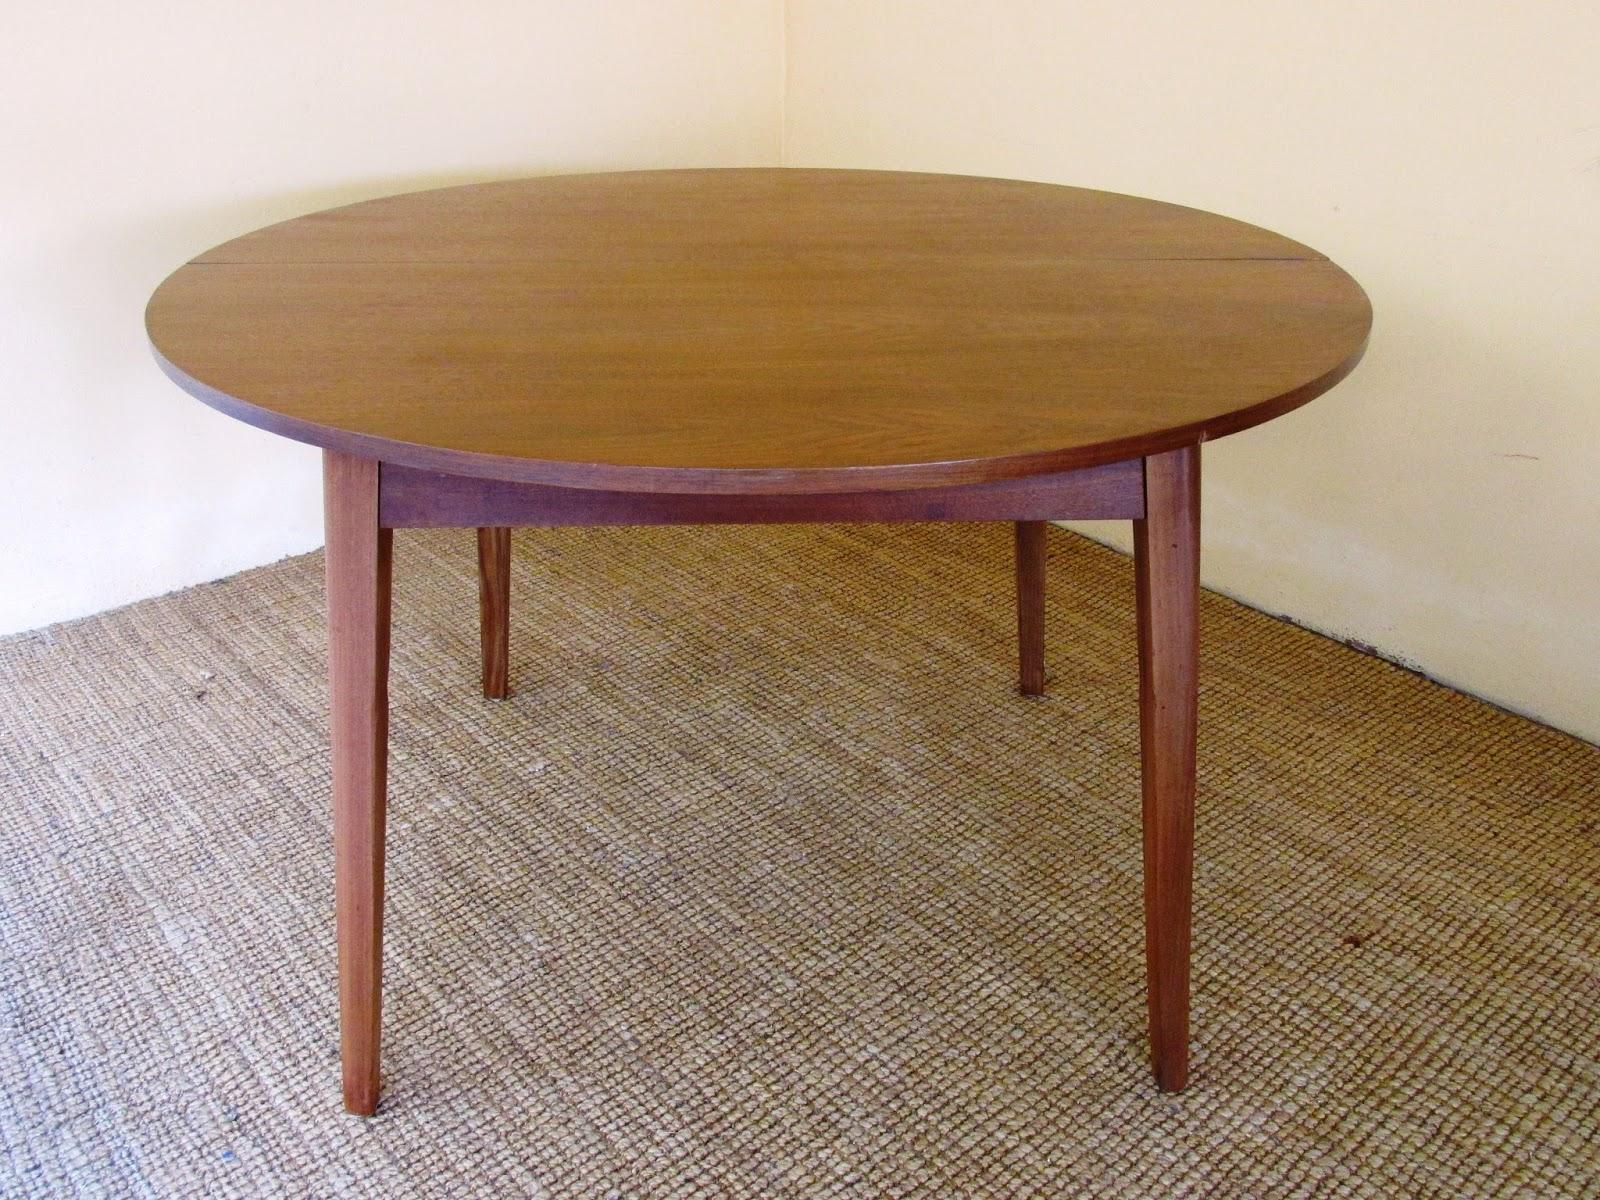 Colección Siglo XX. Antigüedades y Diseño.: Mesa redonda extensible ...